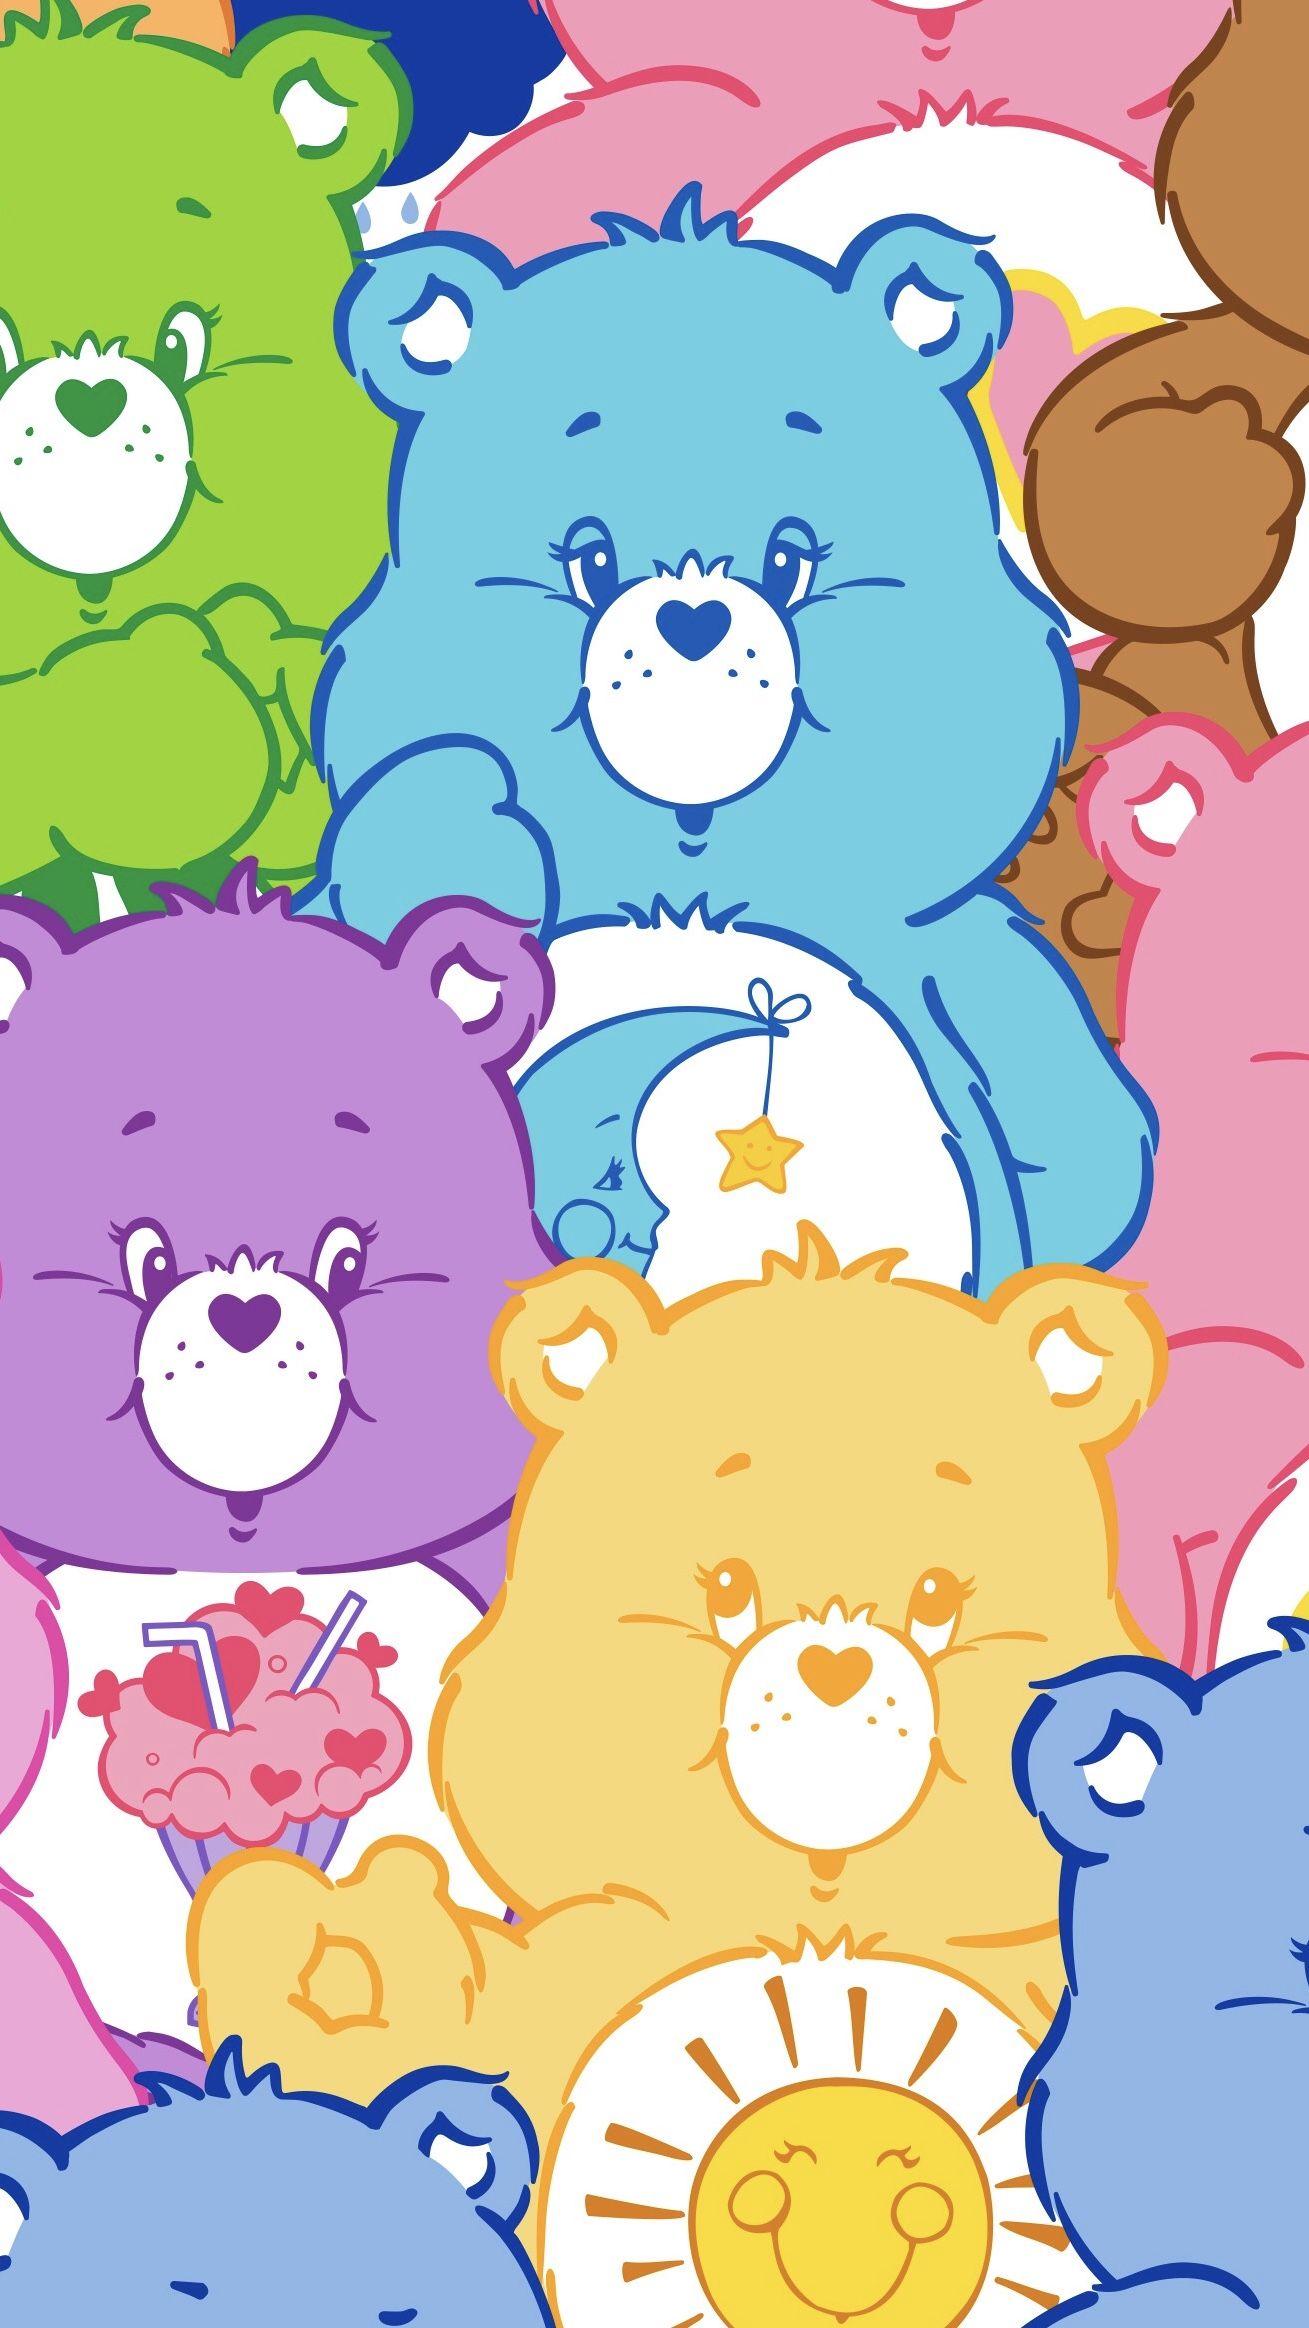 Care Bears Cartoon Wallpaper Iphone Wallpaper Iphone Cute Cute Cartoon Wallpapers